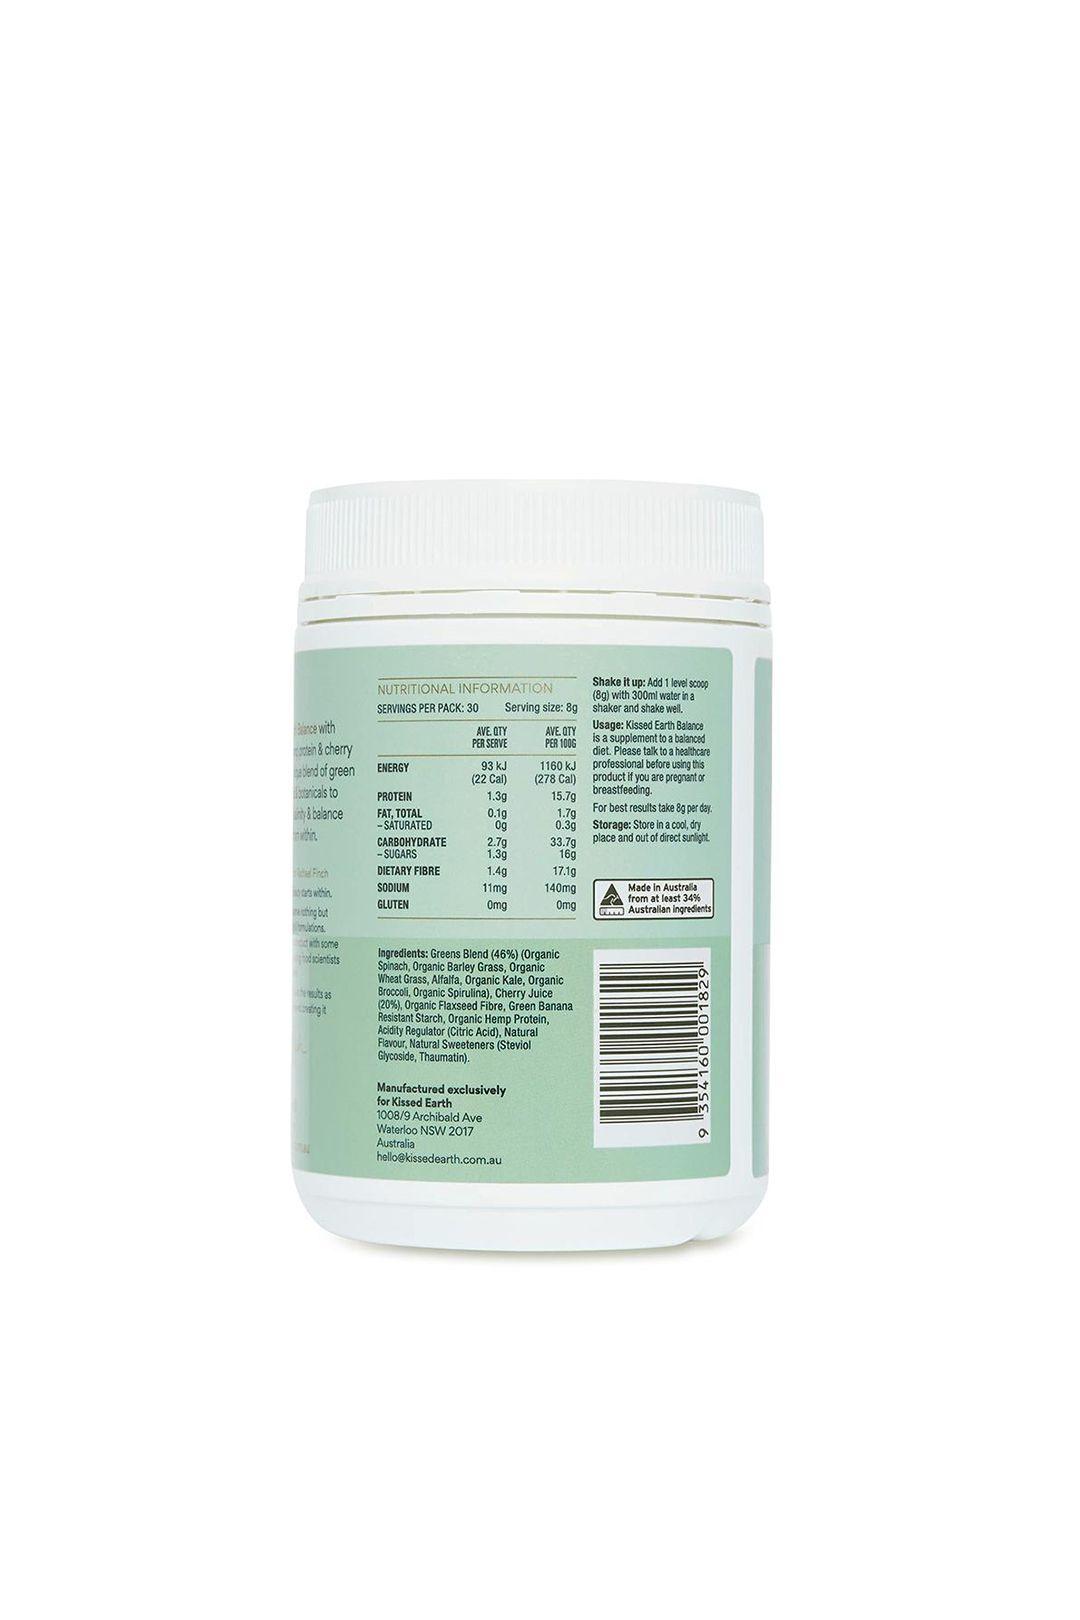 kissed-earth-balance-organic-hemp-protein-cherry-juice-alkalising-supplement-back2